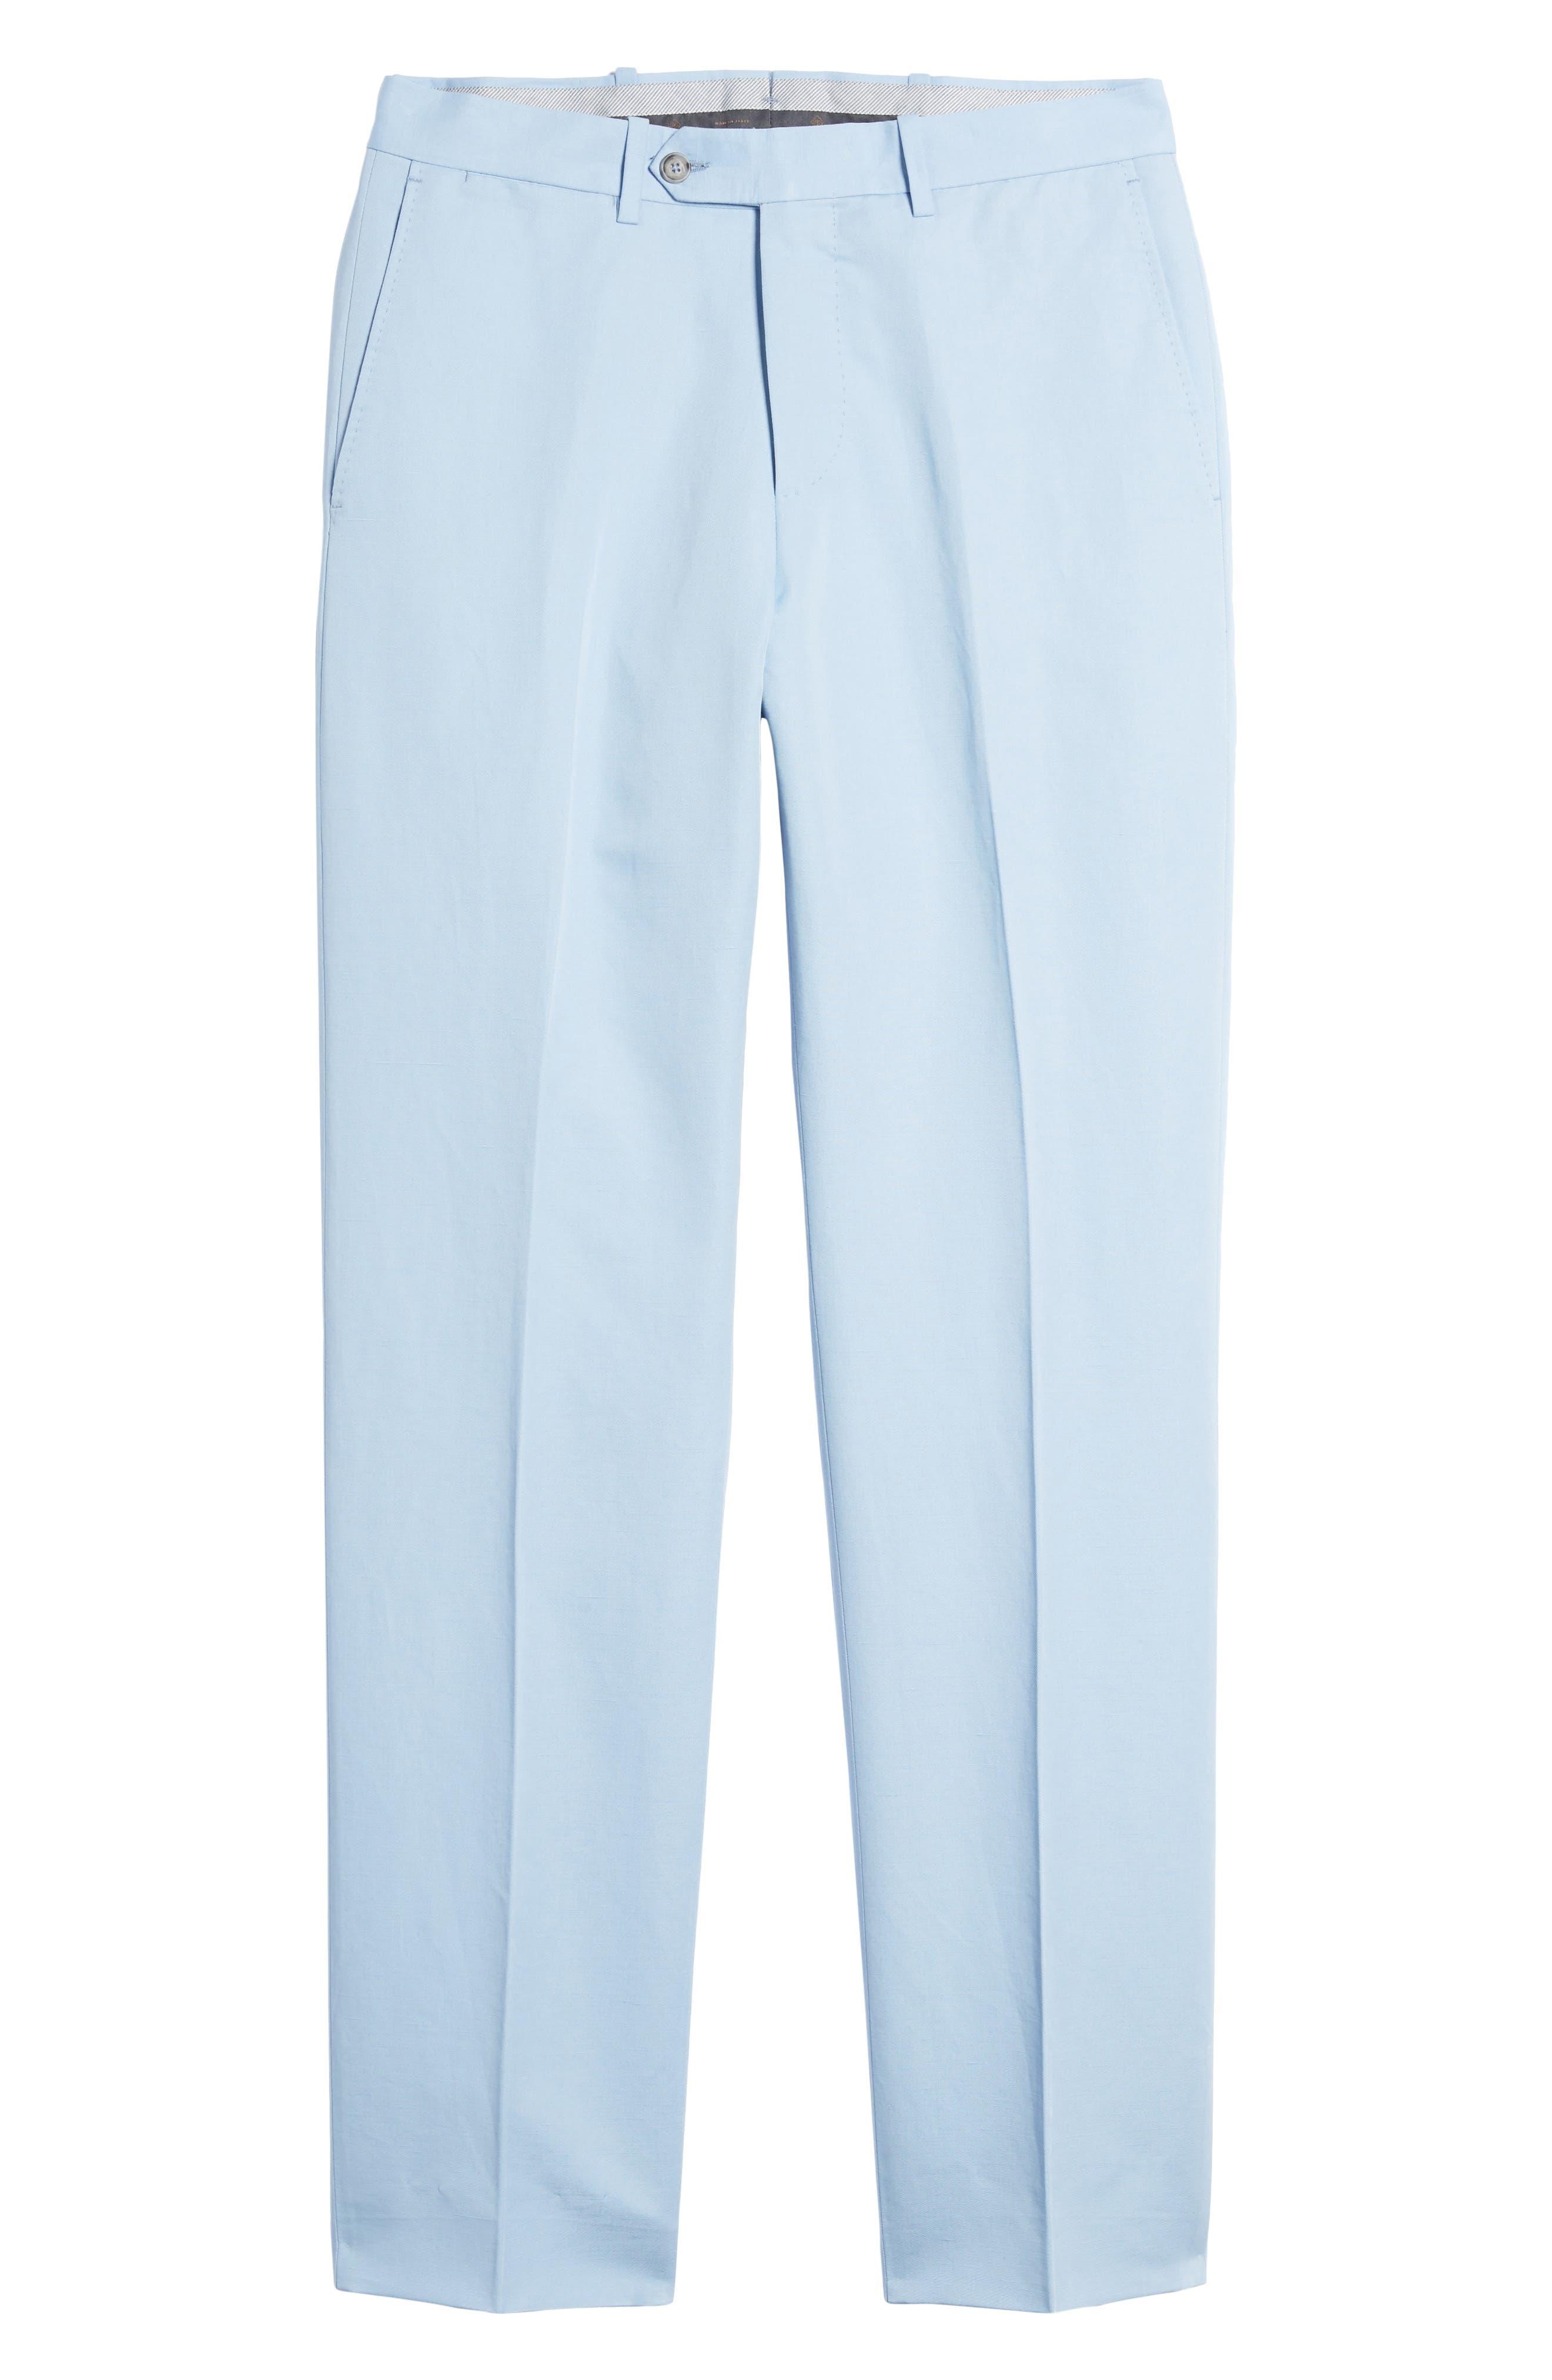 Flat Front Solid Cotton & Linen Trousers,                             Alternate thumbnail 23, color,